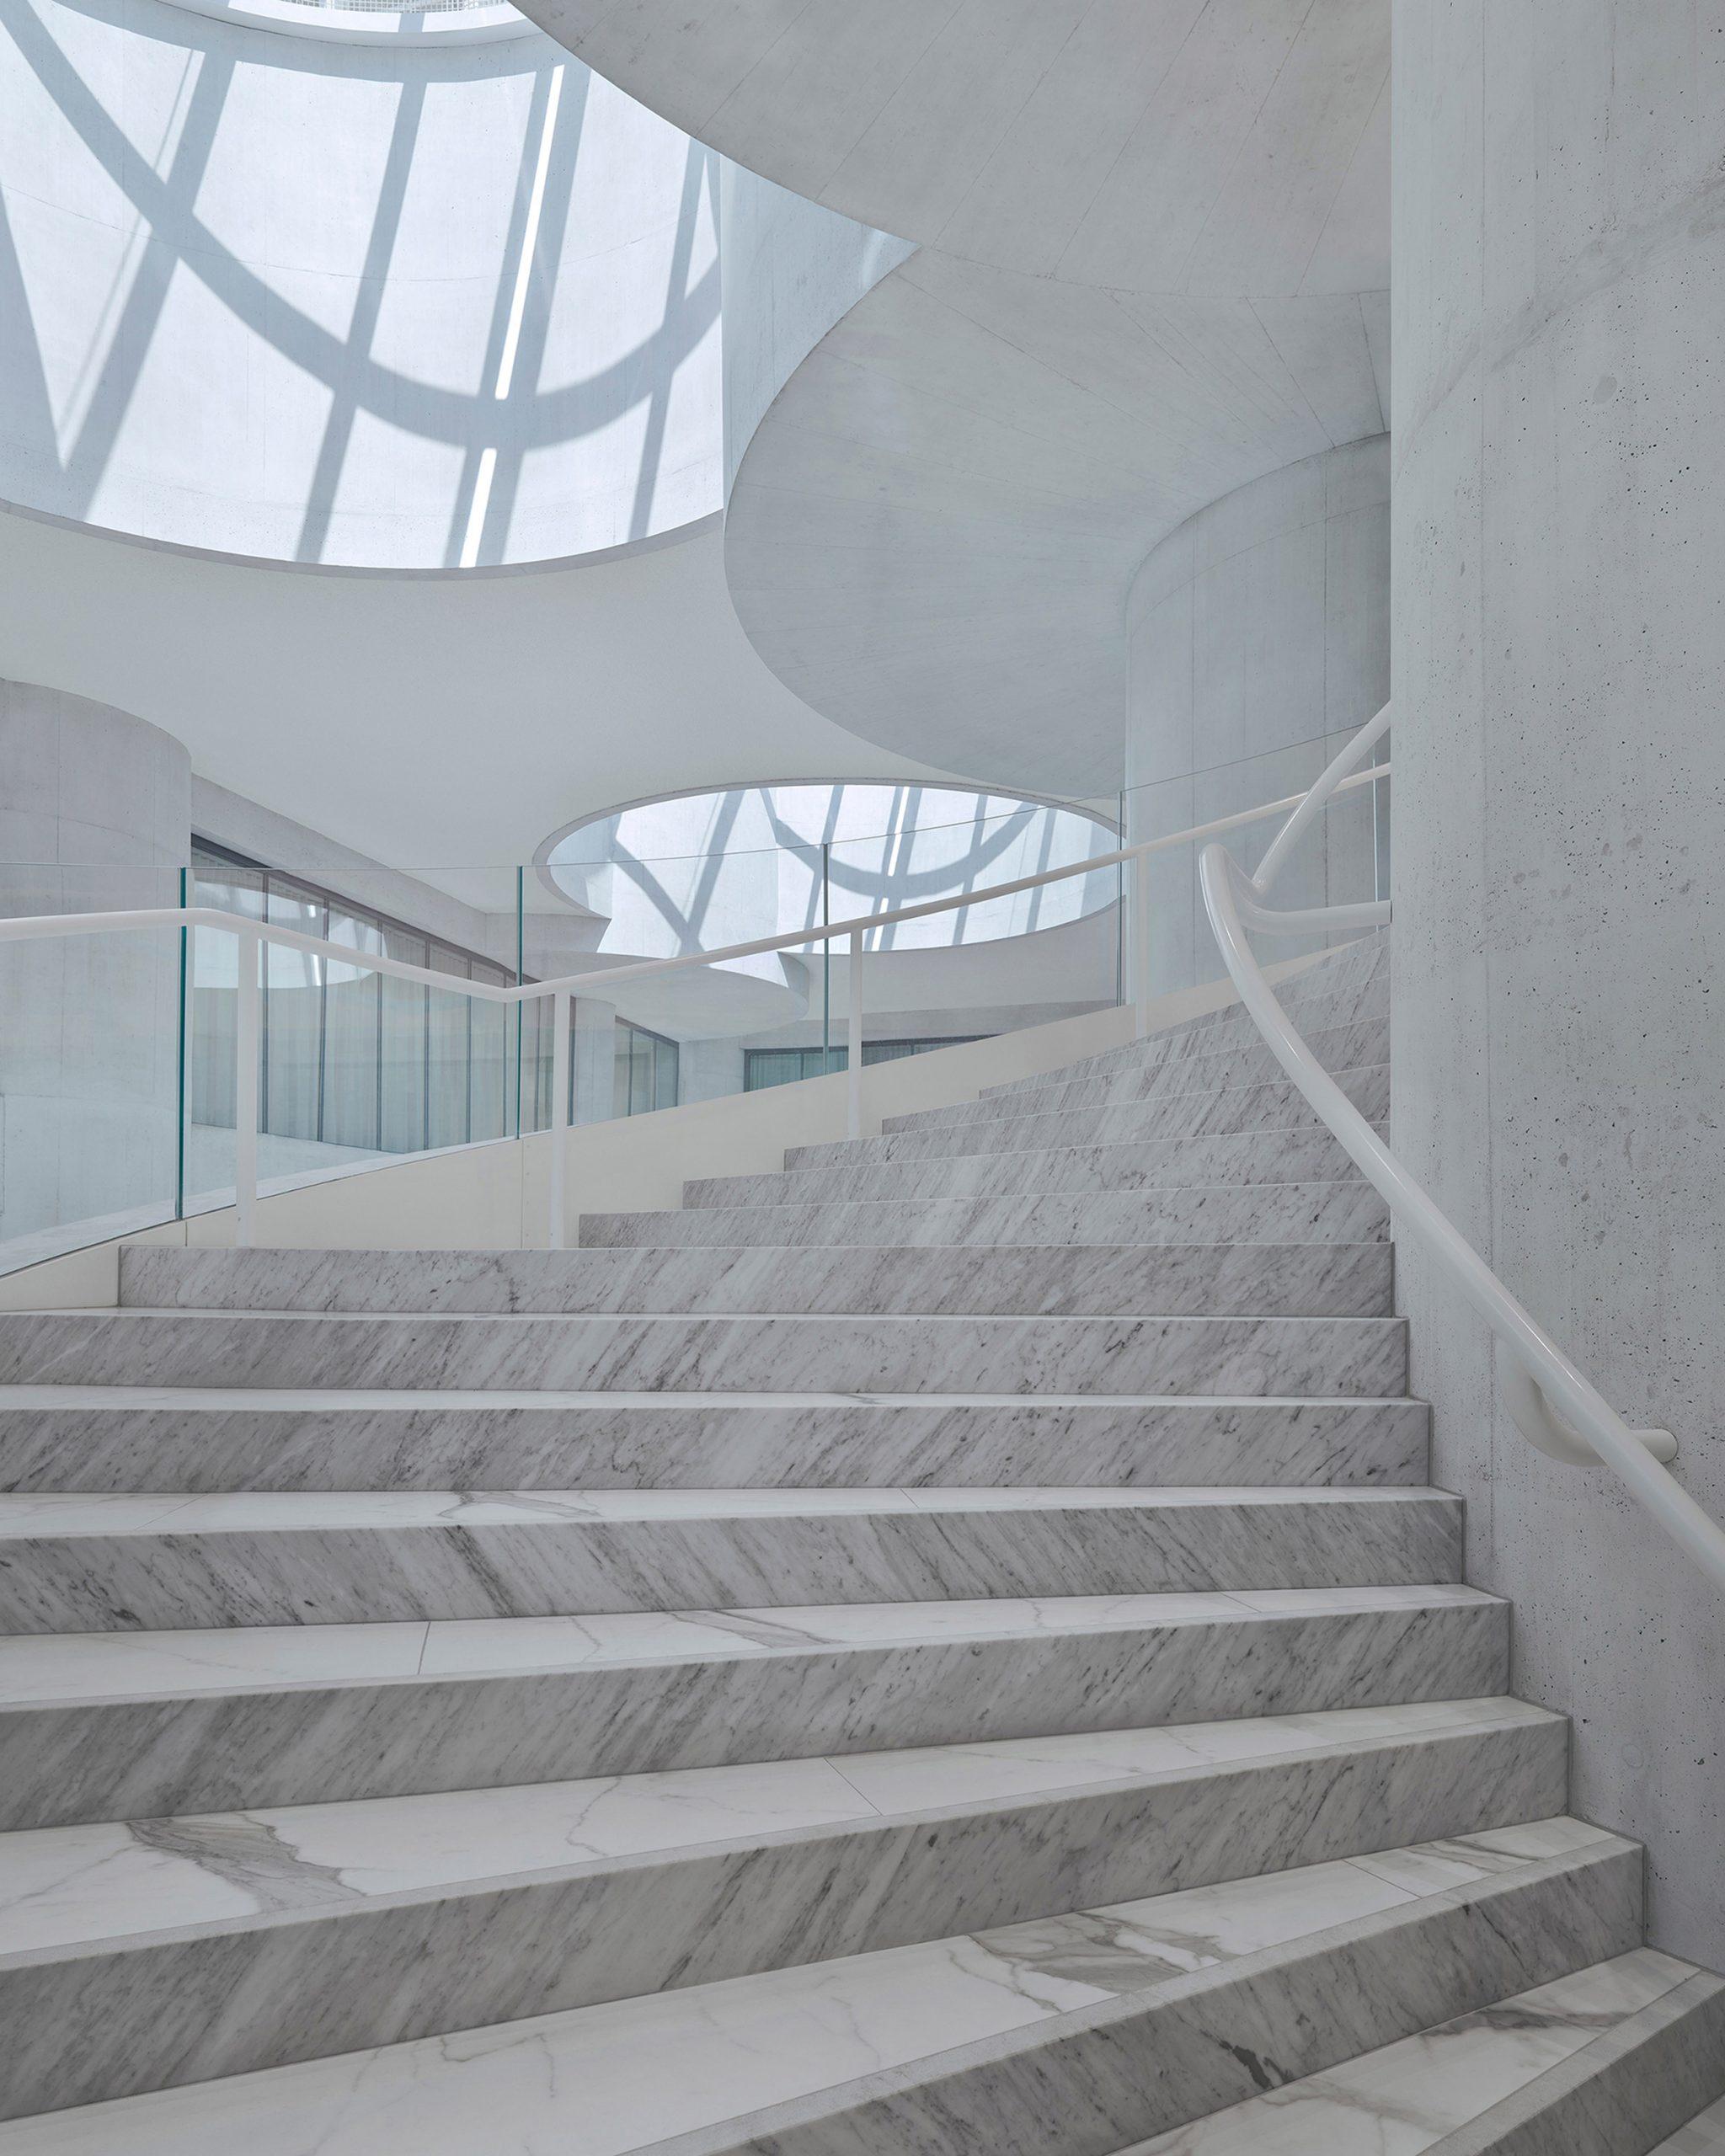 Lindt Home of Chocolate by Christ & Gantenbein spiral staircase